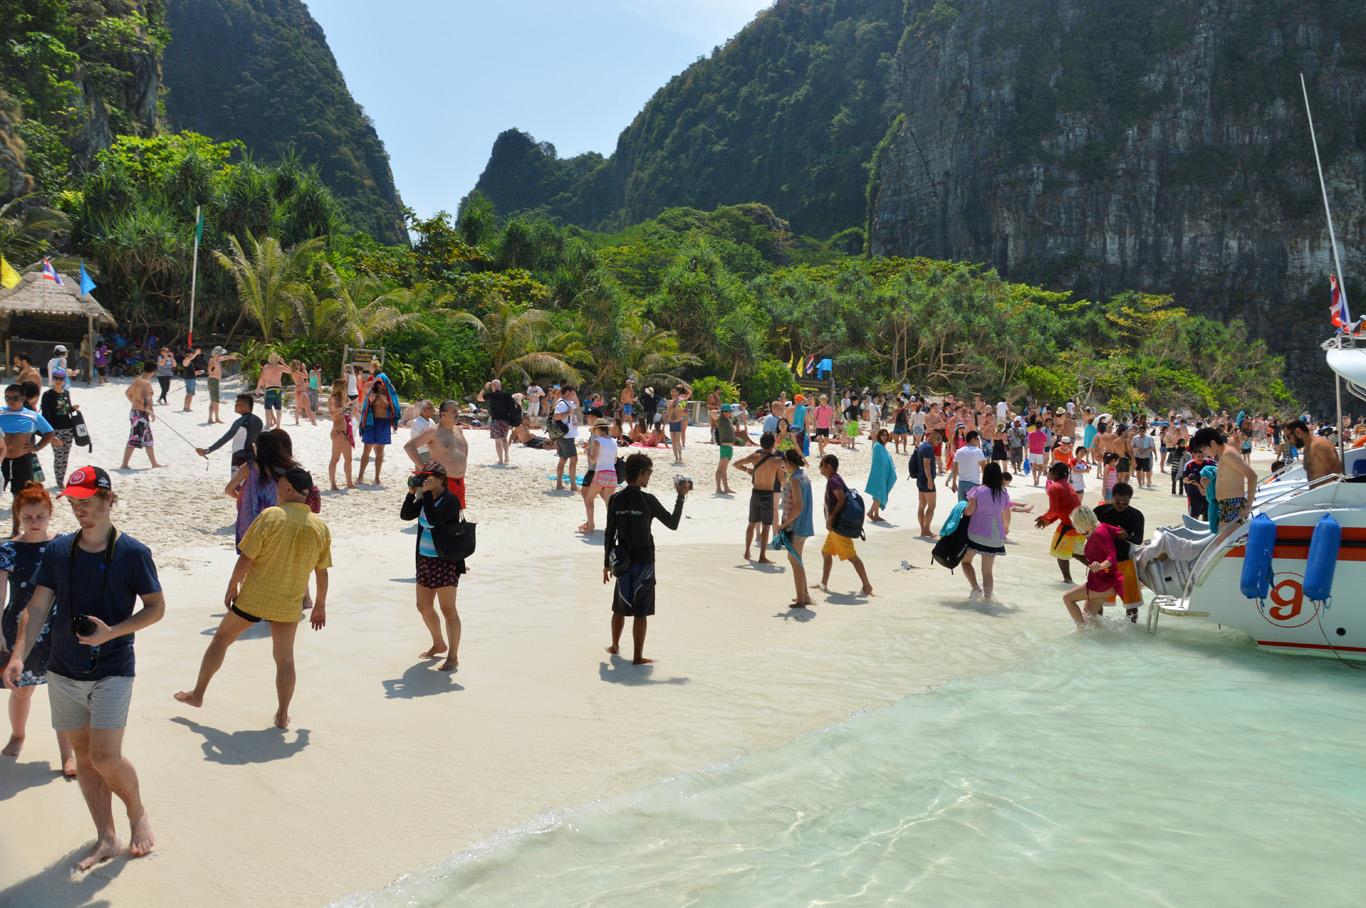 Overcrowded beach at Maya Bay